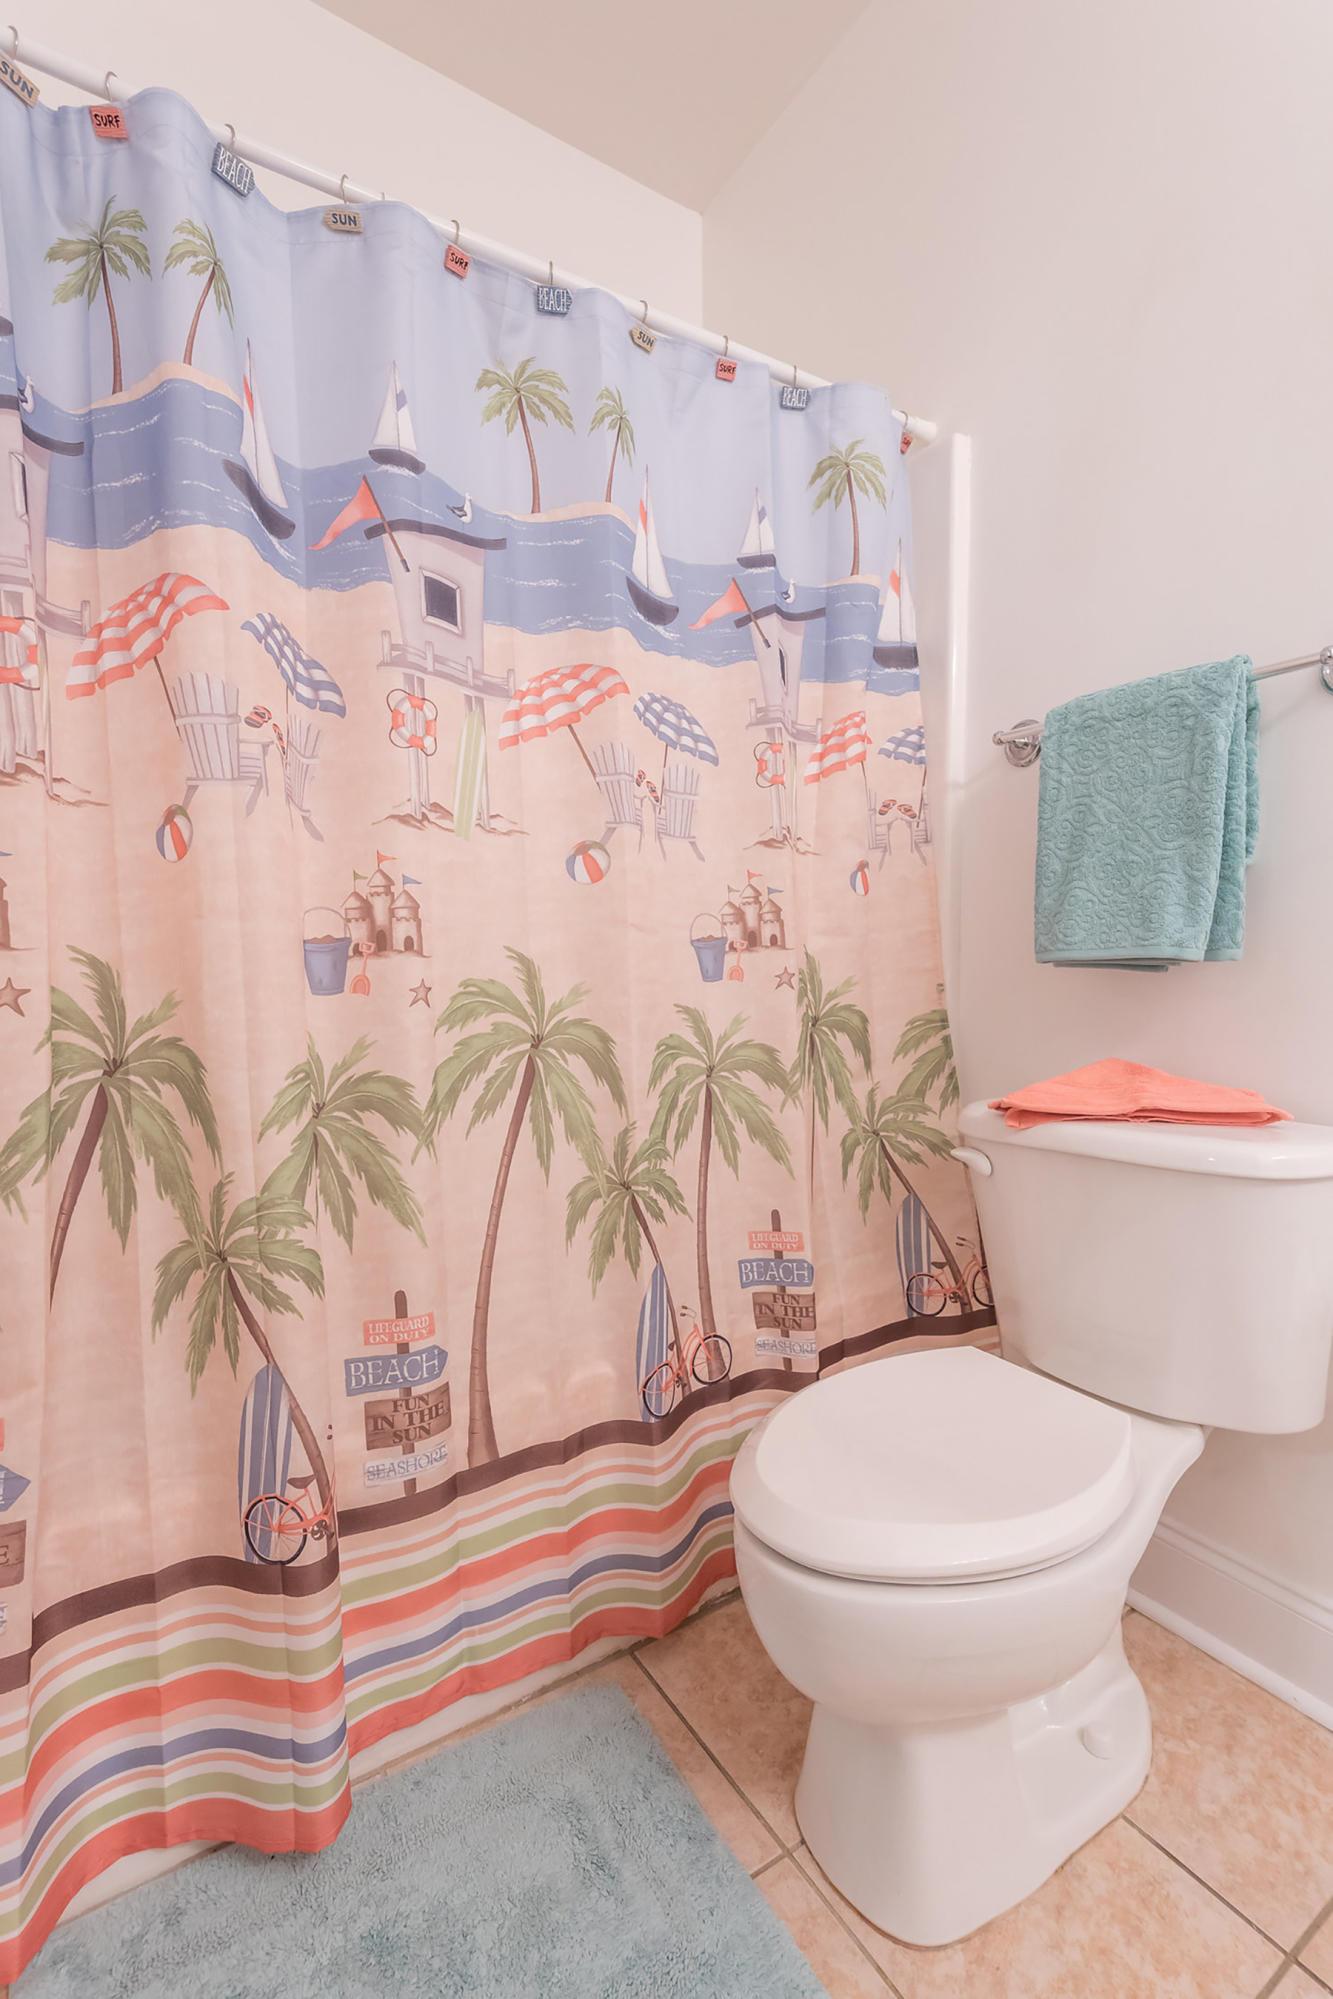 Pier Pointe Villas Homes For Sale - 114 Ashley, Folly Beach, SC - 6